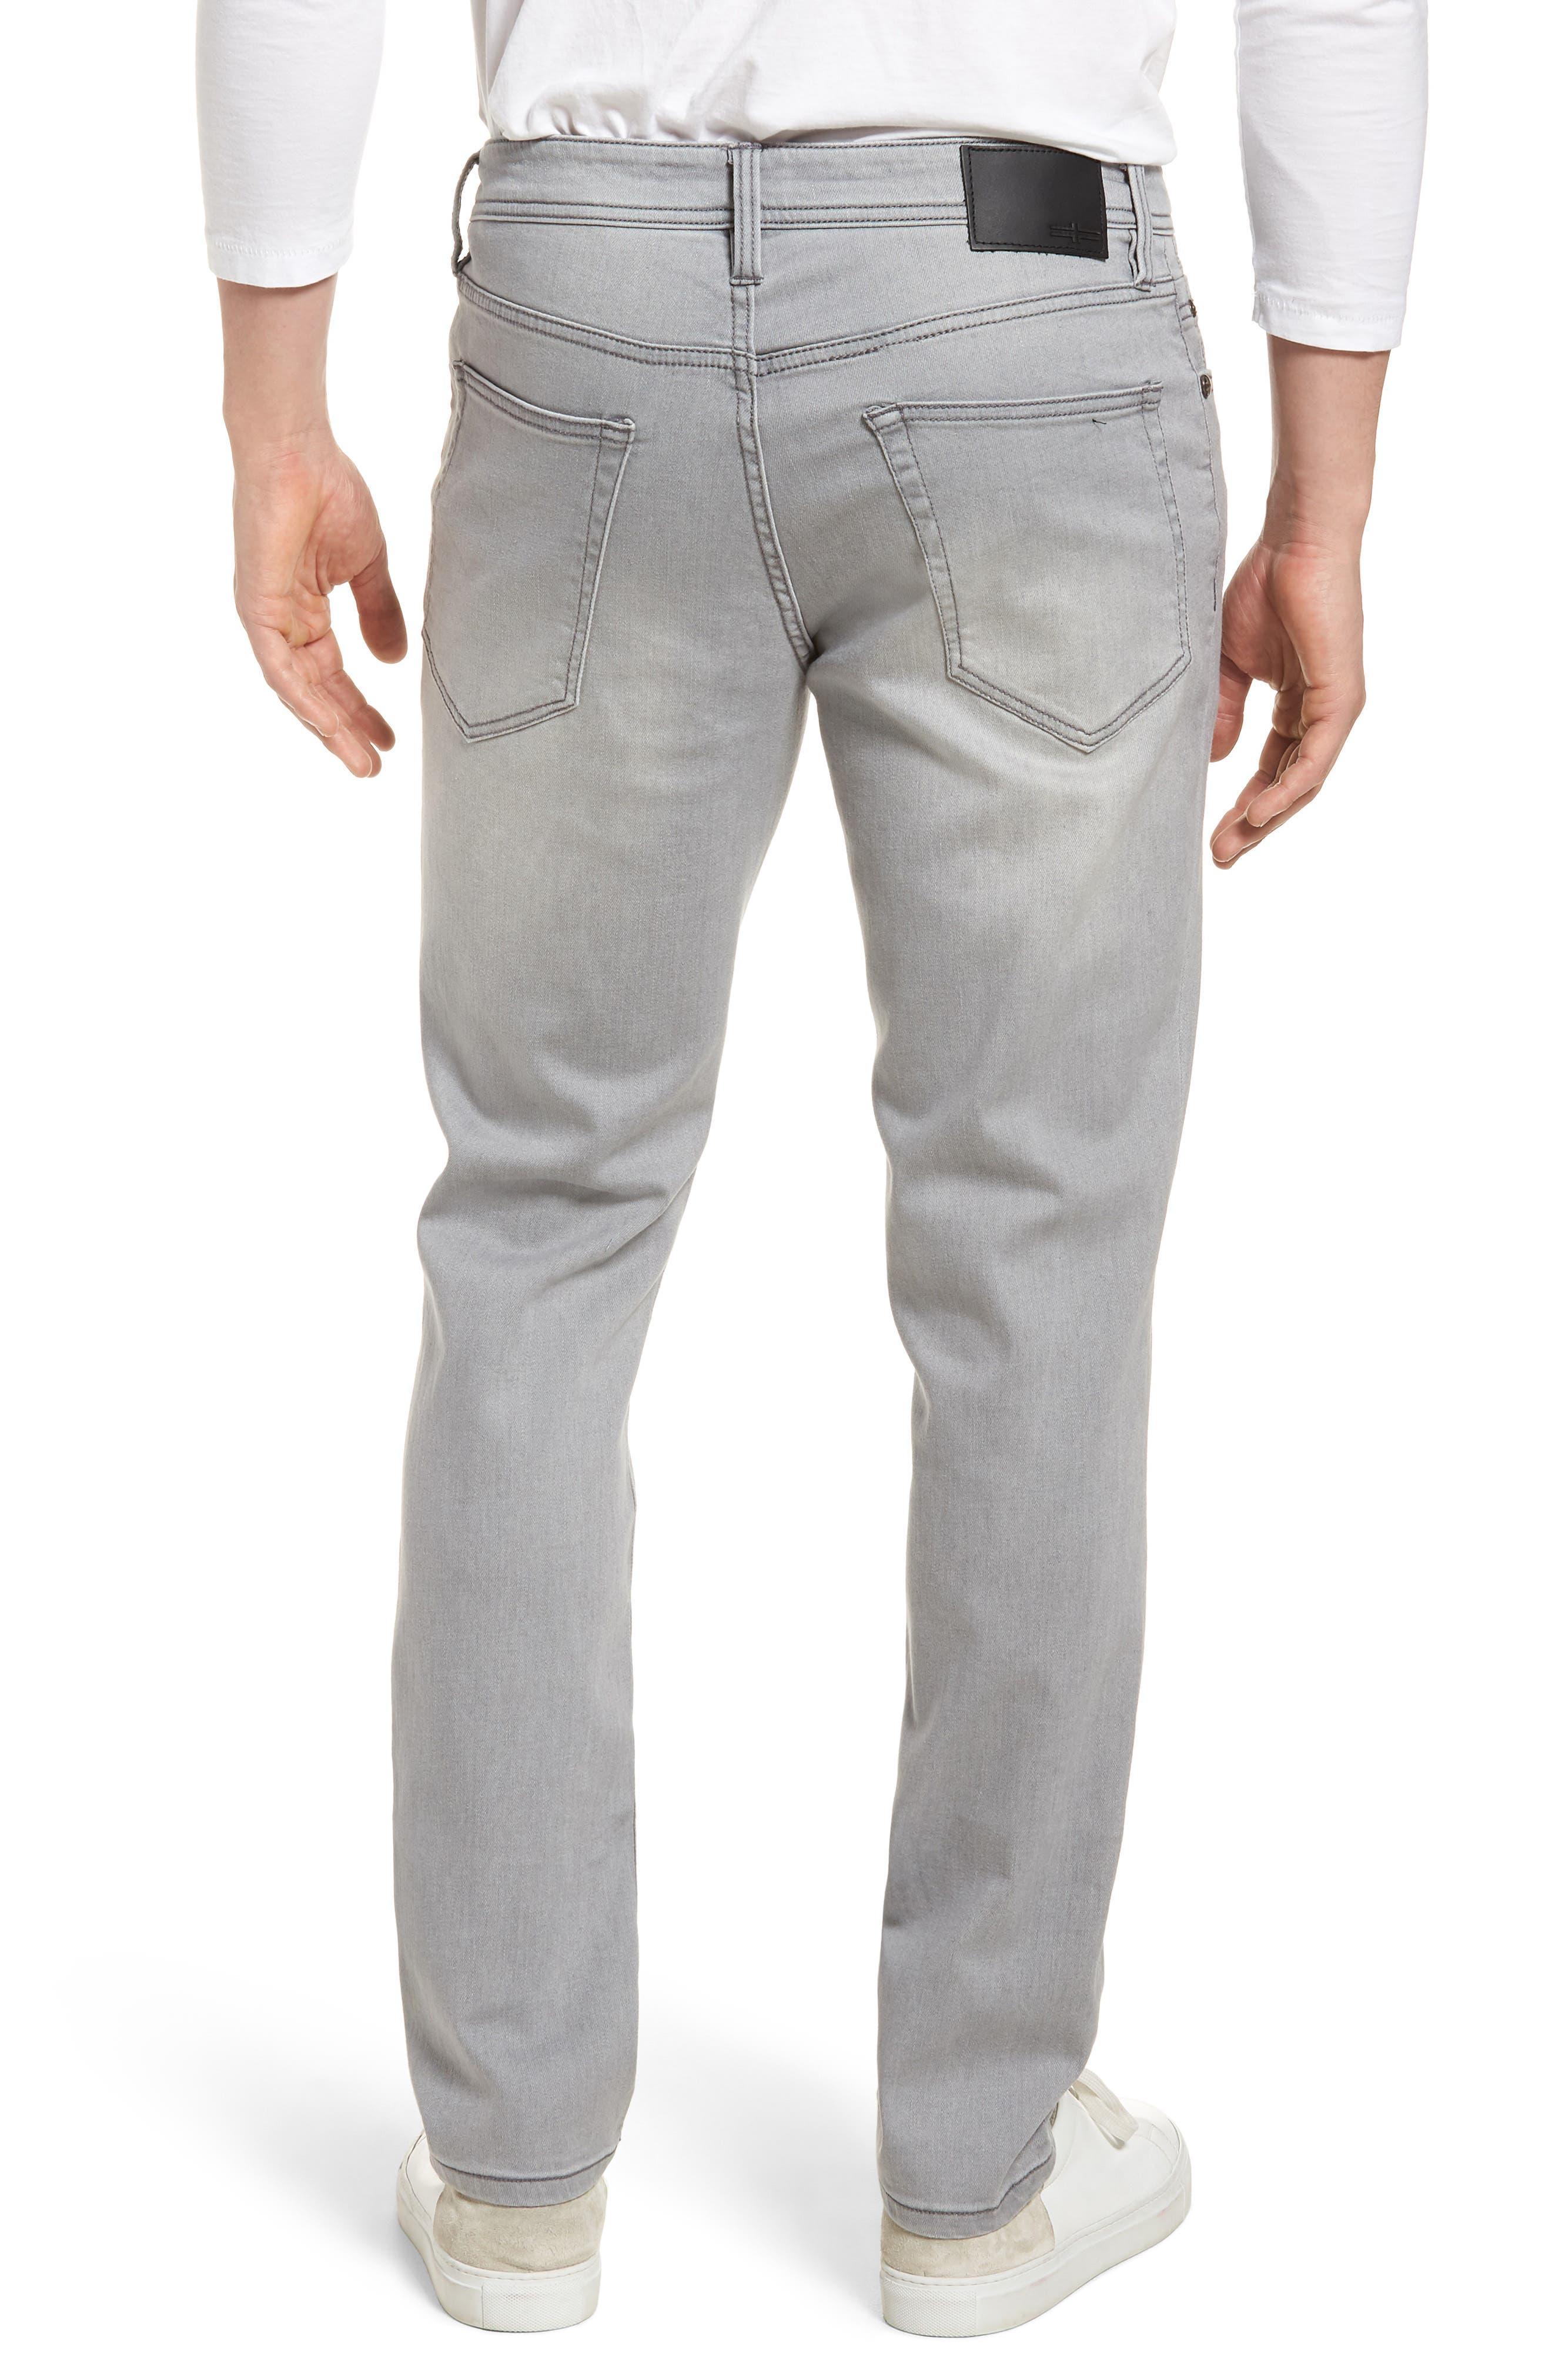 Jeans Co. Kingston Slim Straight Leg Jeans,                             Alternate thumbnail 2, color,                             Coal Mine Dark